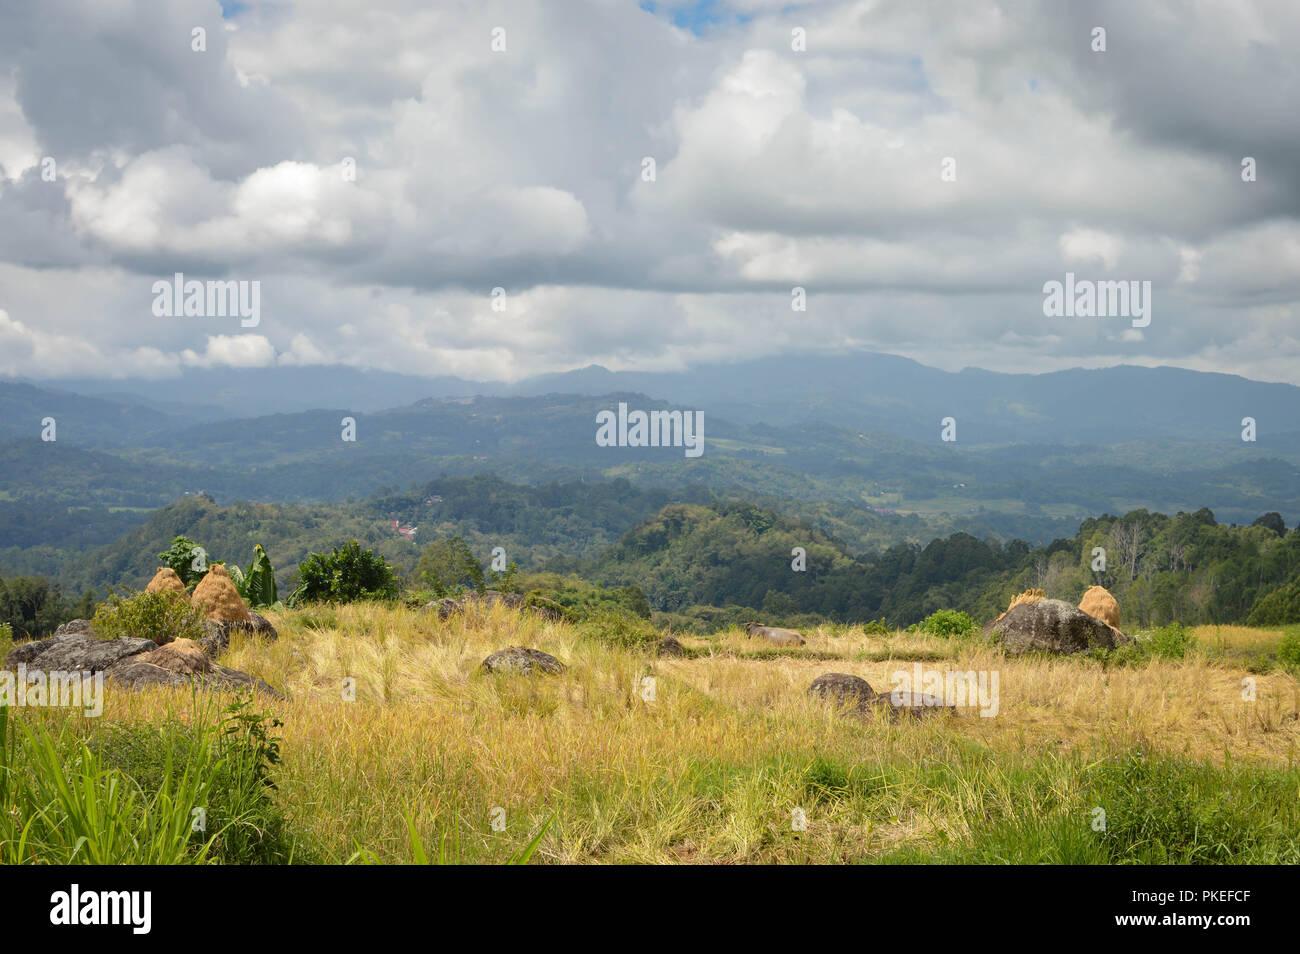 Beautiful landscape of the rice fields and rice being harvested in Tana Toraja highlands near Batutumongi village. South Sulawesi, Indonesia Stock Photo